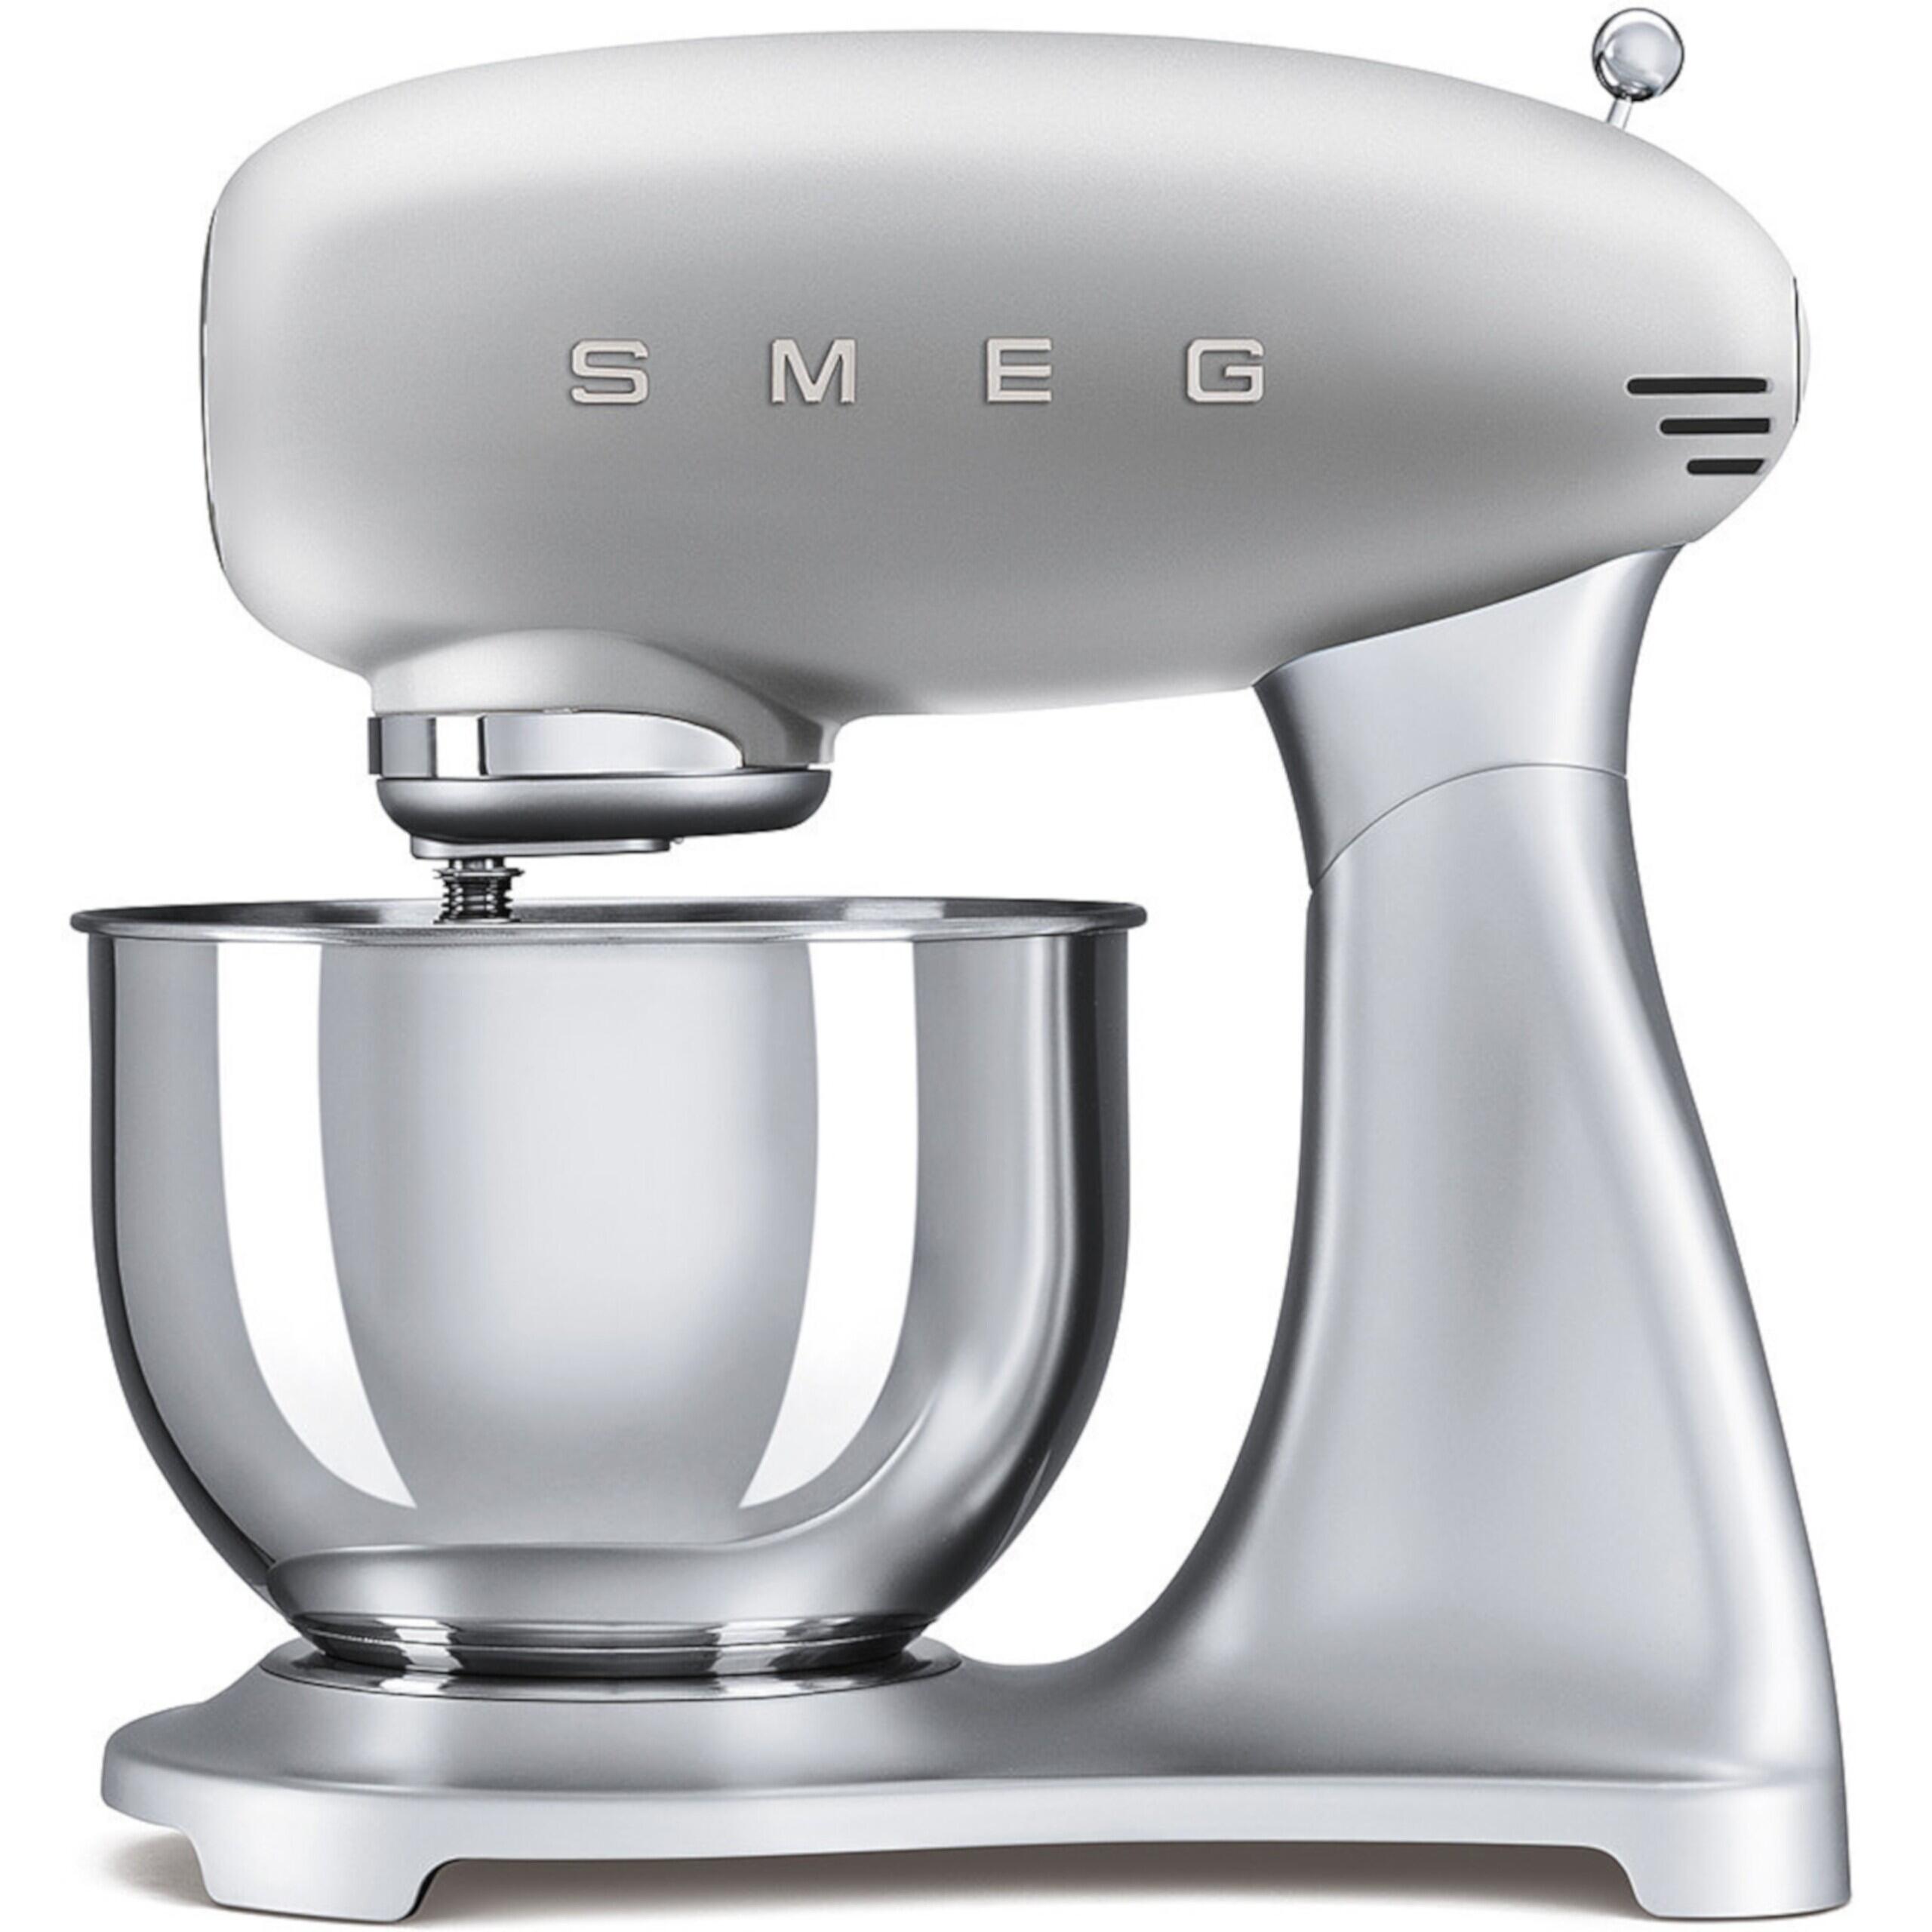 "SMEG Küchenmaschine ""50's Retro Style"" (Silber) SMF01SVEU"